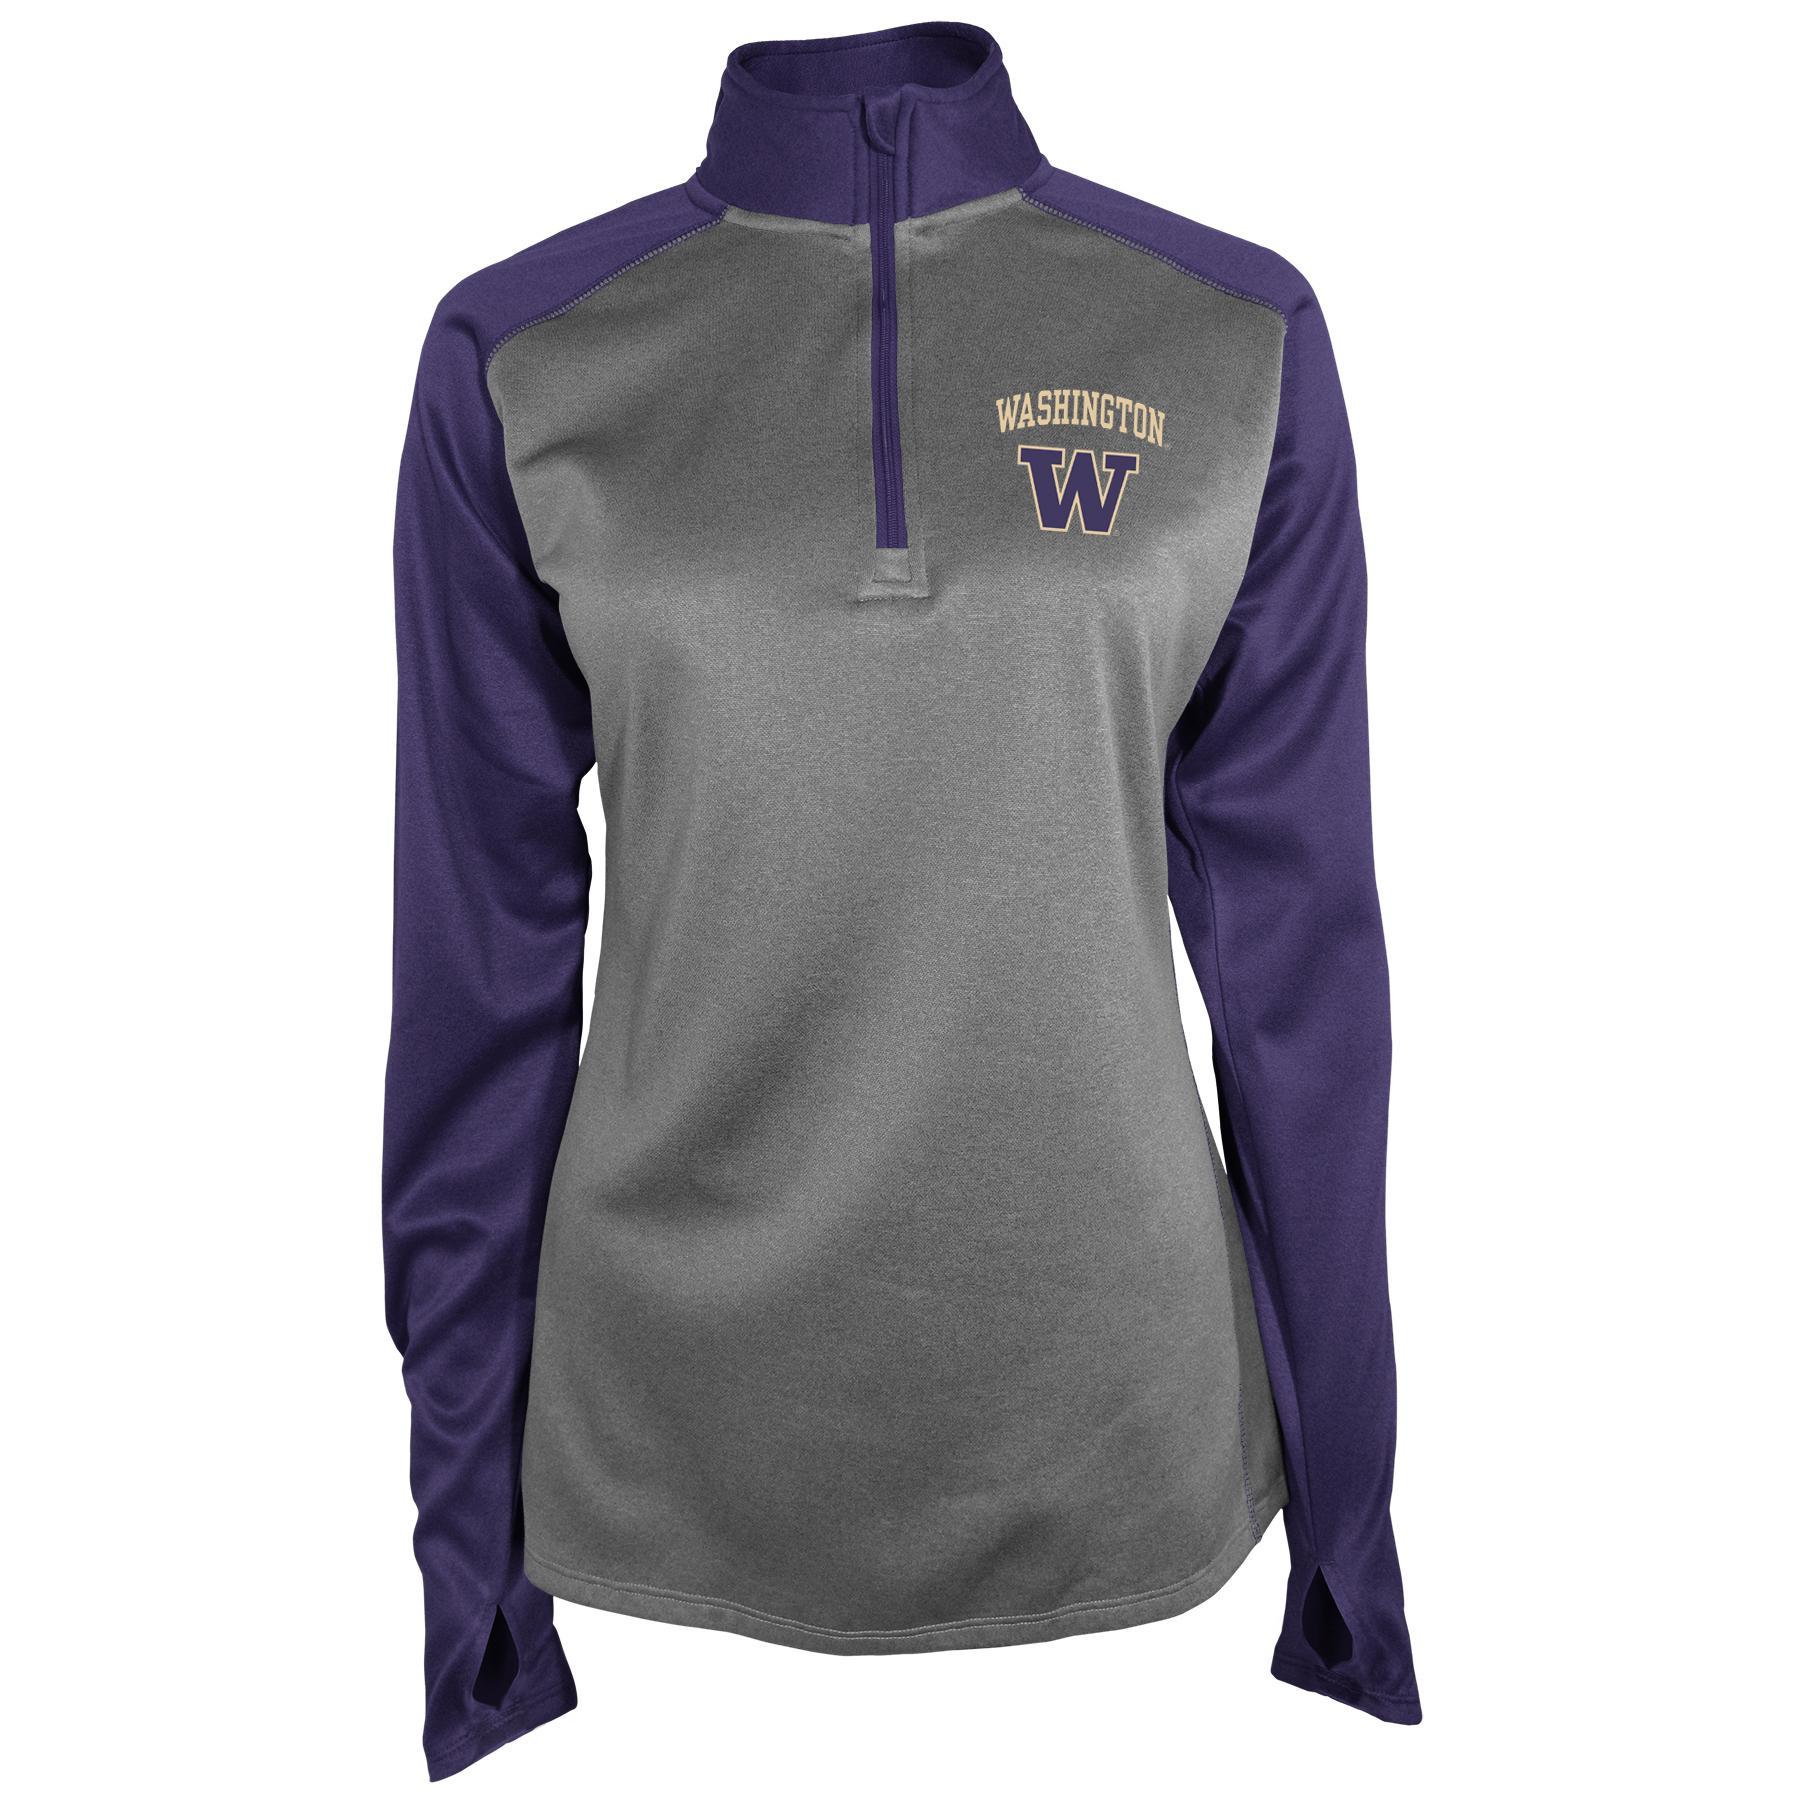 NCAA Women's Quarter-Zip Athletic Shirt - University of Washington PartNumber: 046VA90528612P MfgPartNumber: 7AL5G2AKMF